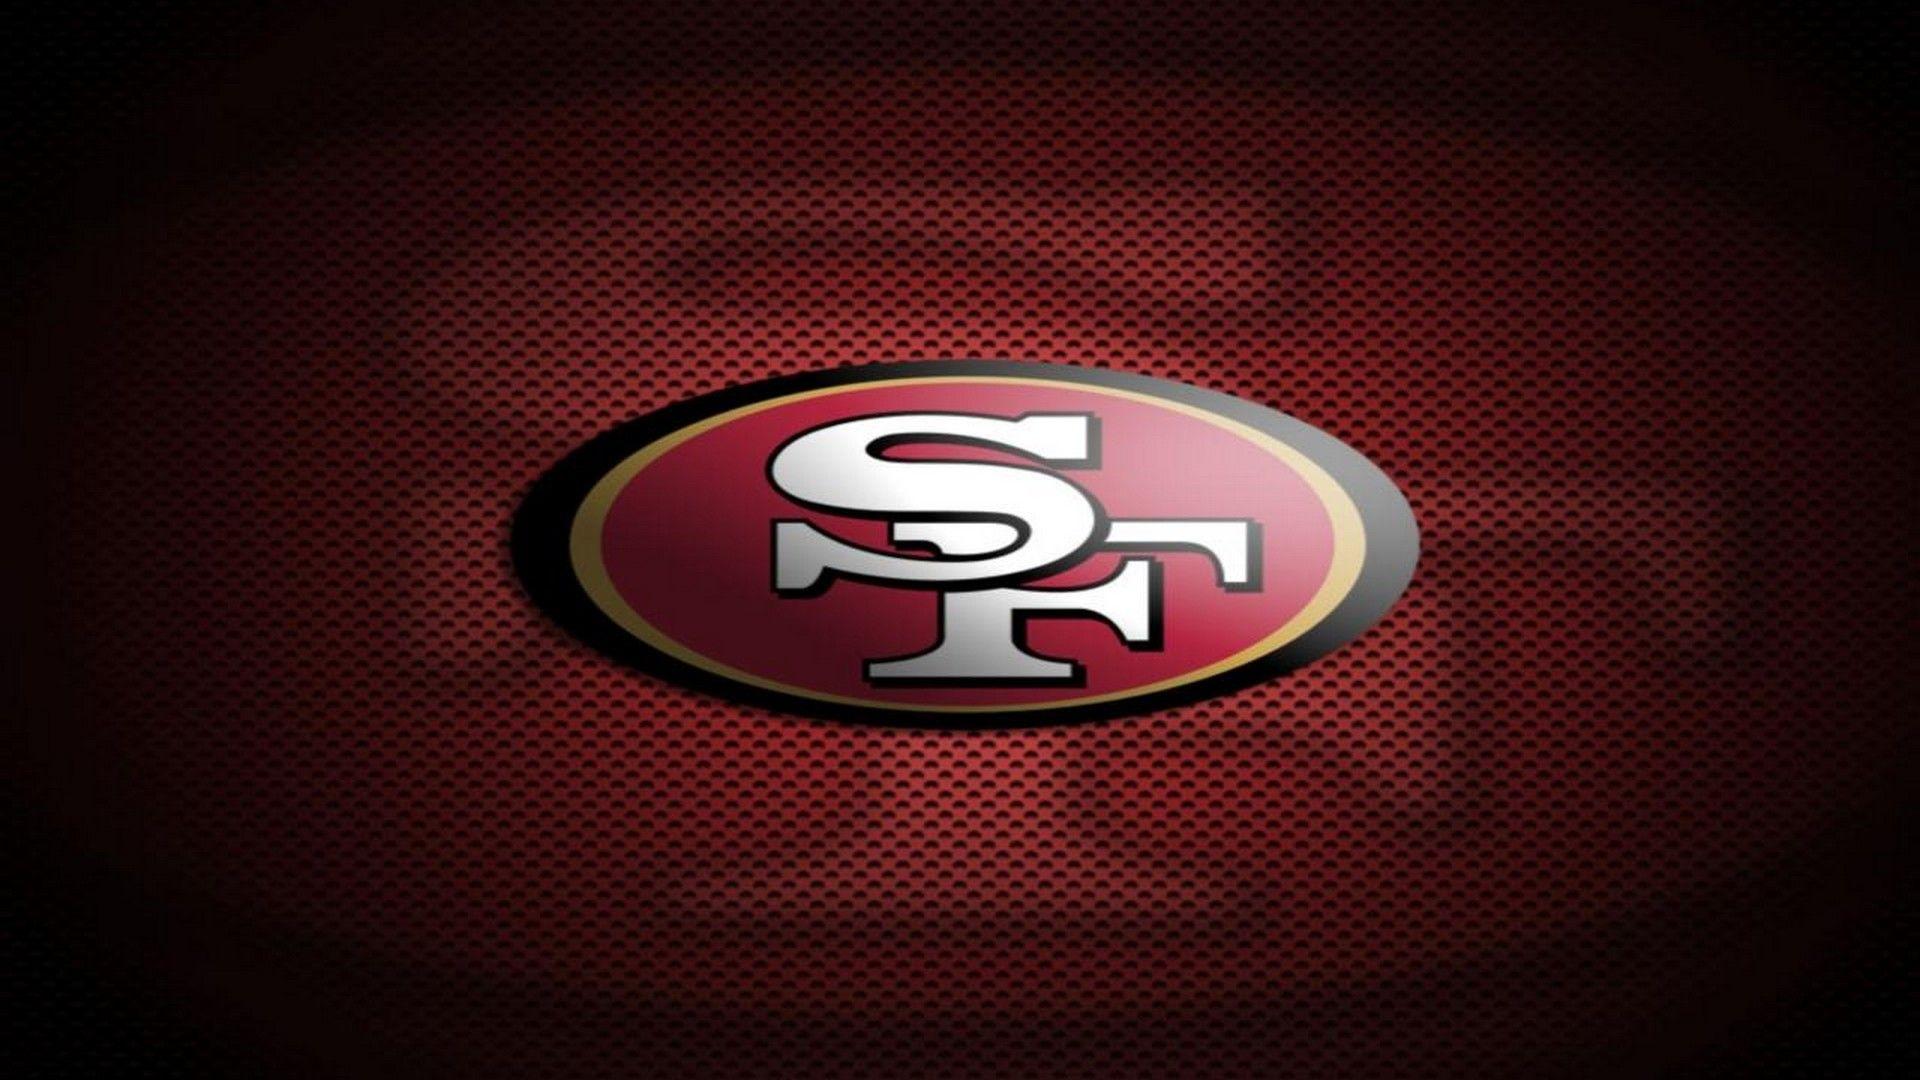 Nfl Wallpapers San Francisco 49ers Logo San Francisco 49ers Sf 49ers